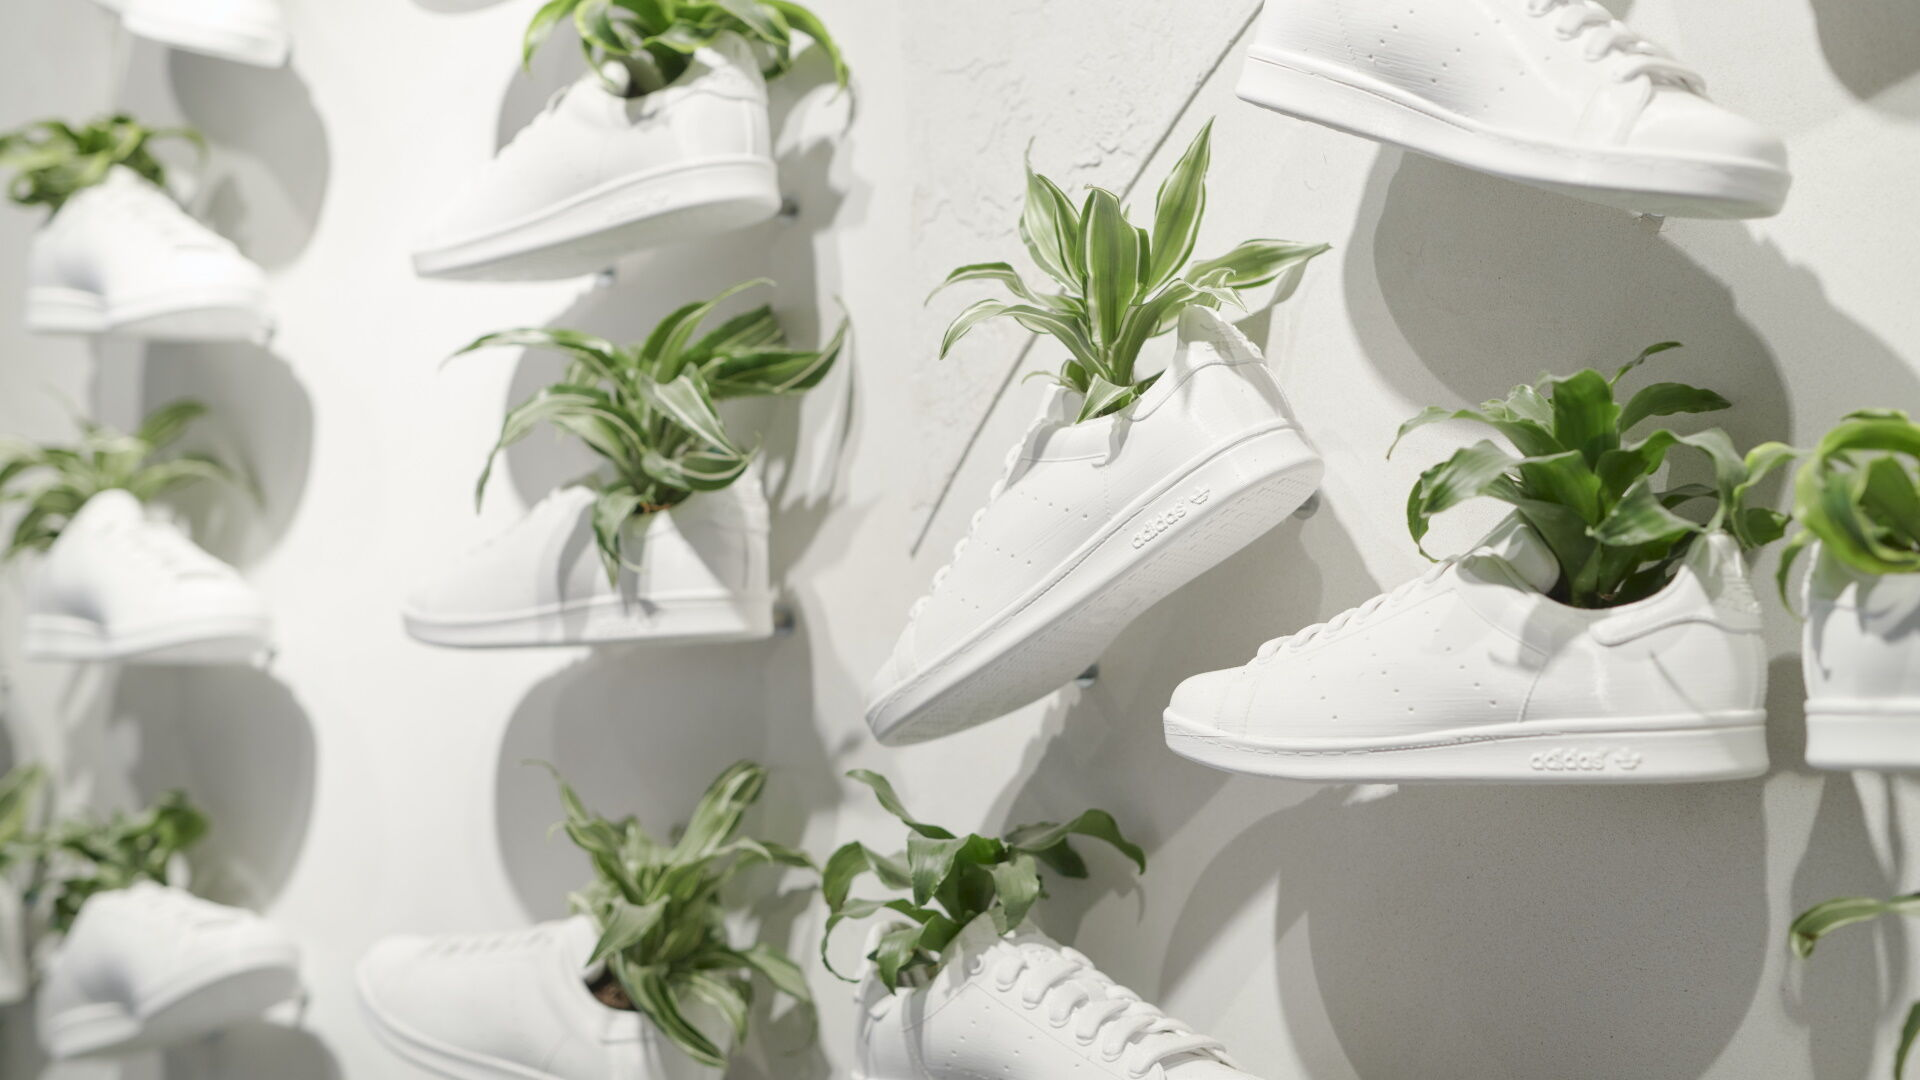 adidas Stan Stmith vegán sneakers cipők a londoni adidas Flagship Store-ban